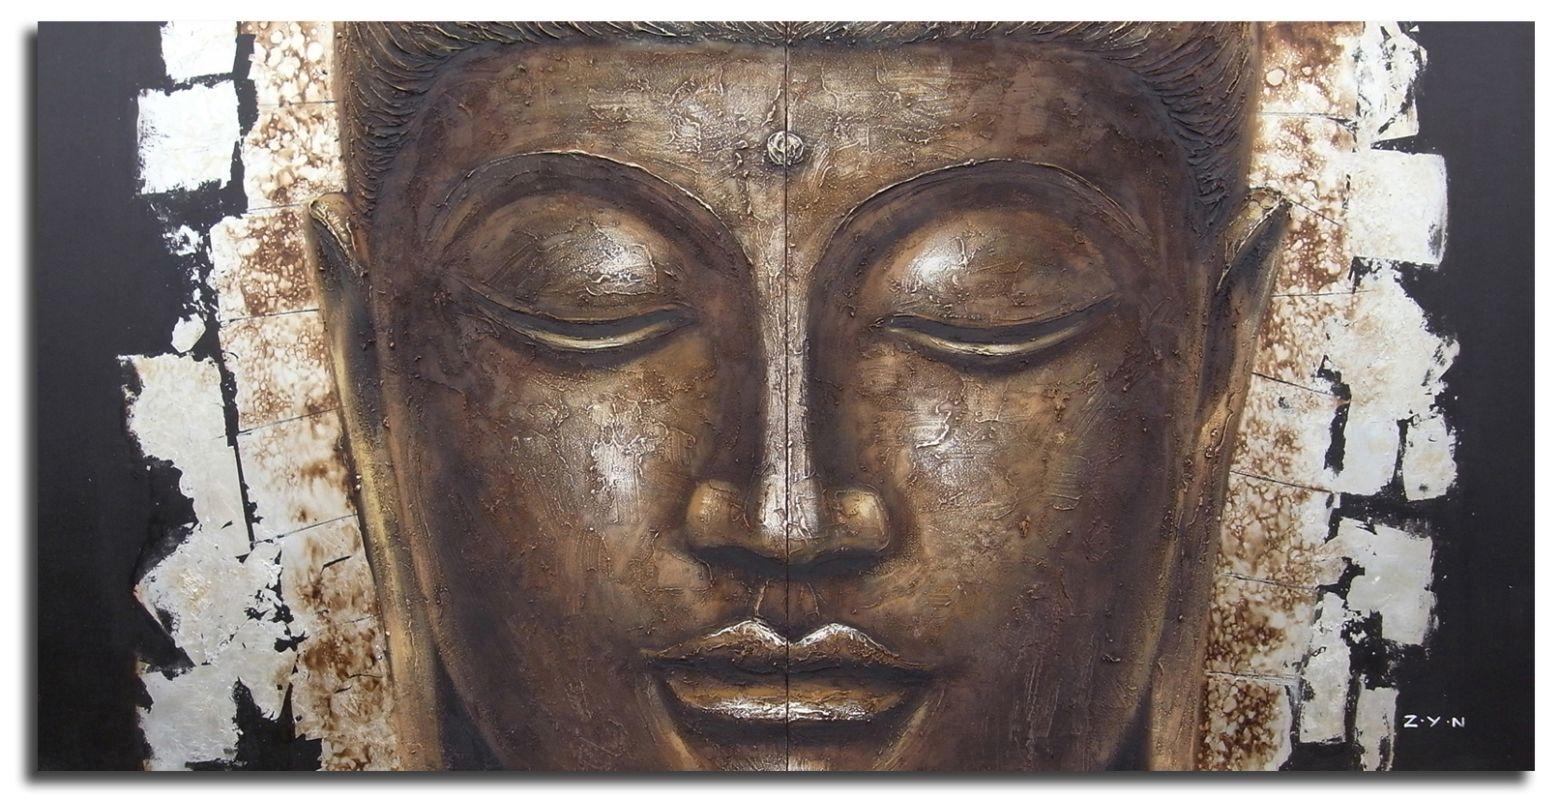 "Safavieh ART2005 31"" x 31"" Buddha Painting Gold / Black Home Decor"